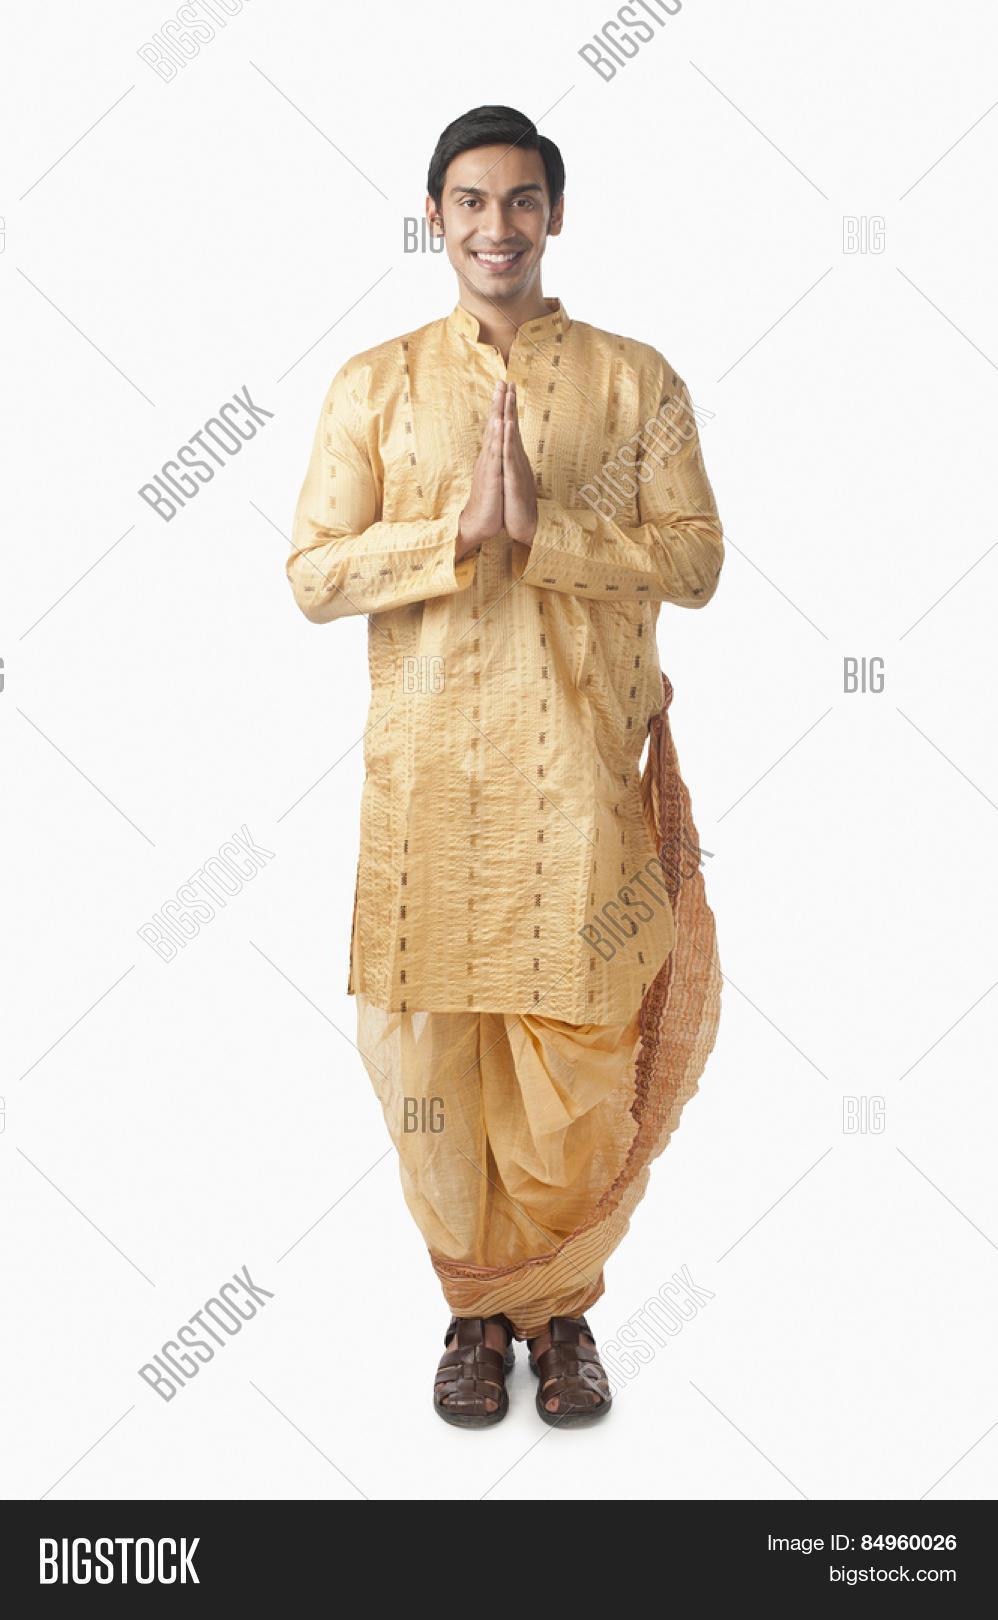 Bengali Man Standing Image & Photo (Free Trial) | Bigstock